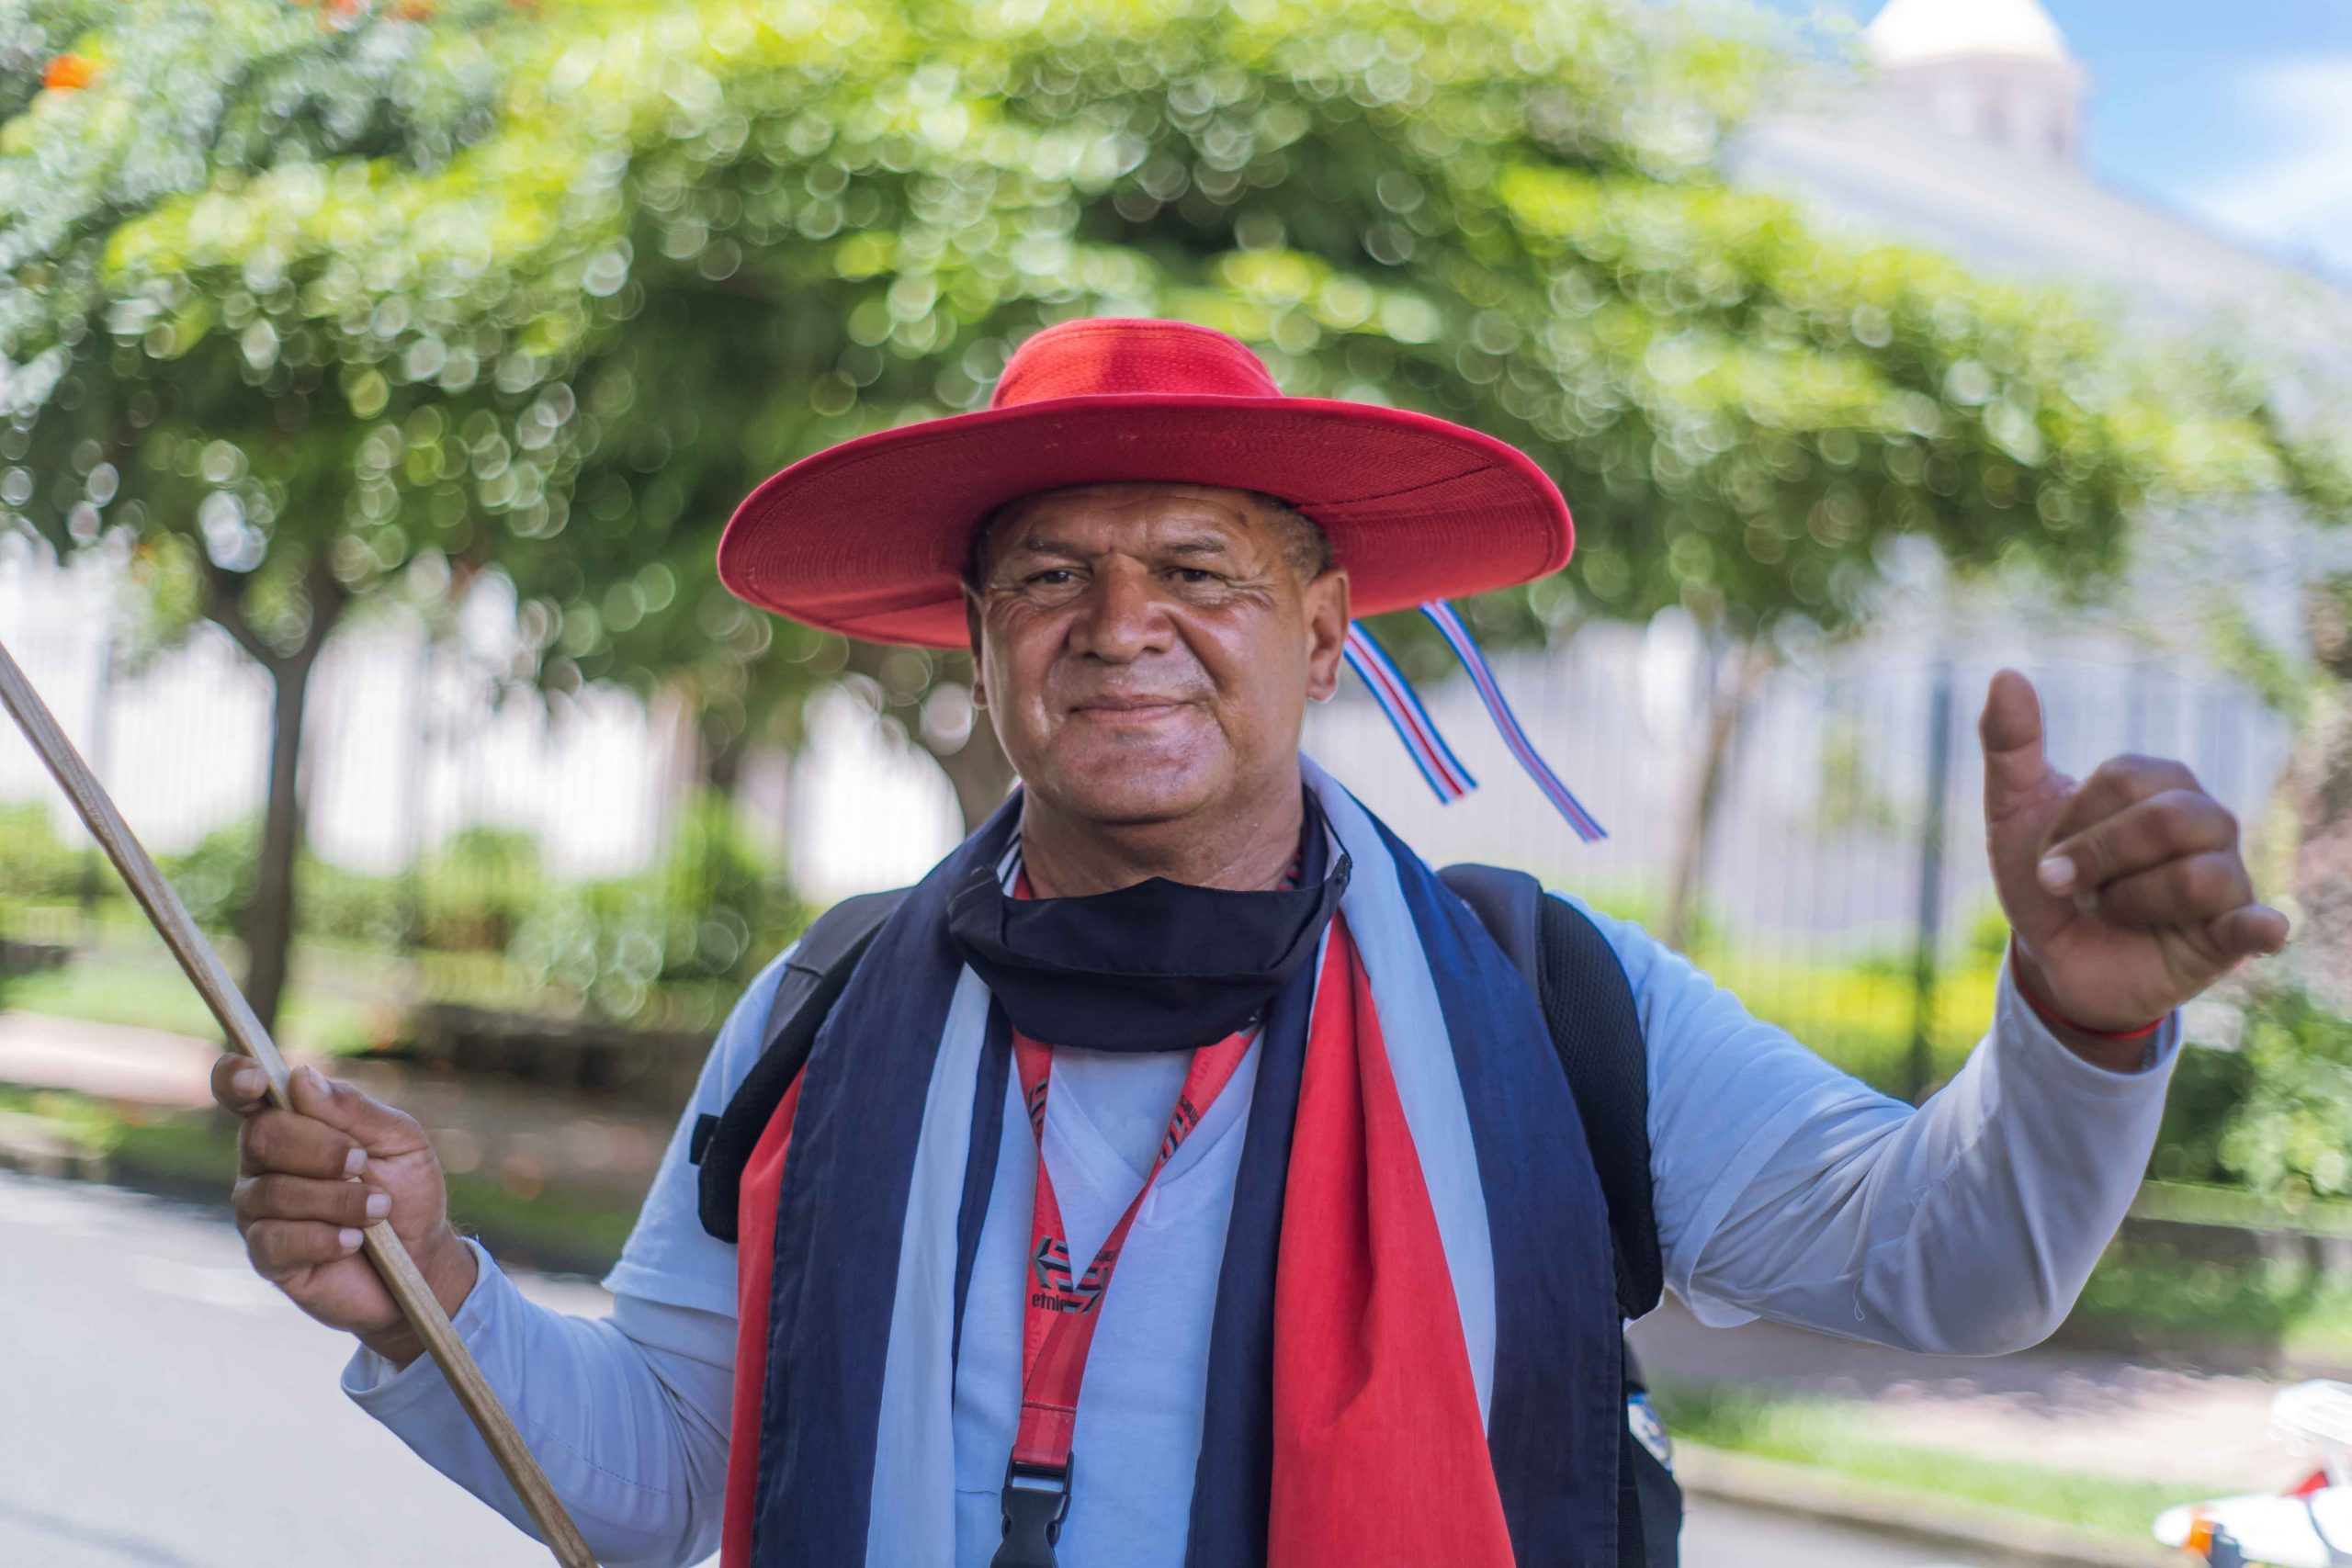 Gerardo ''Tatu'' histórico salvavidas del Ojo de Agua vistió sus mejores galas patrióticas.